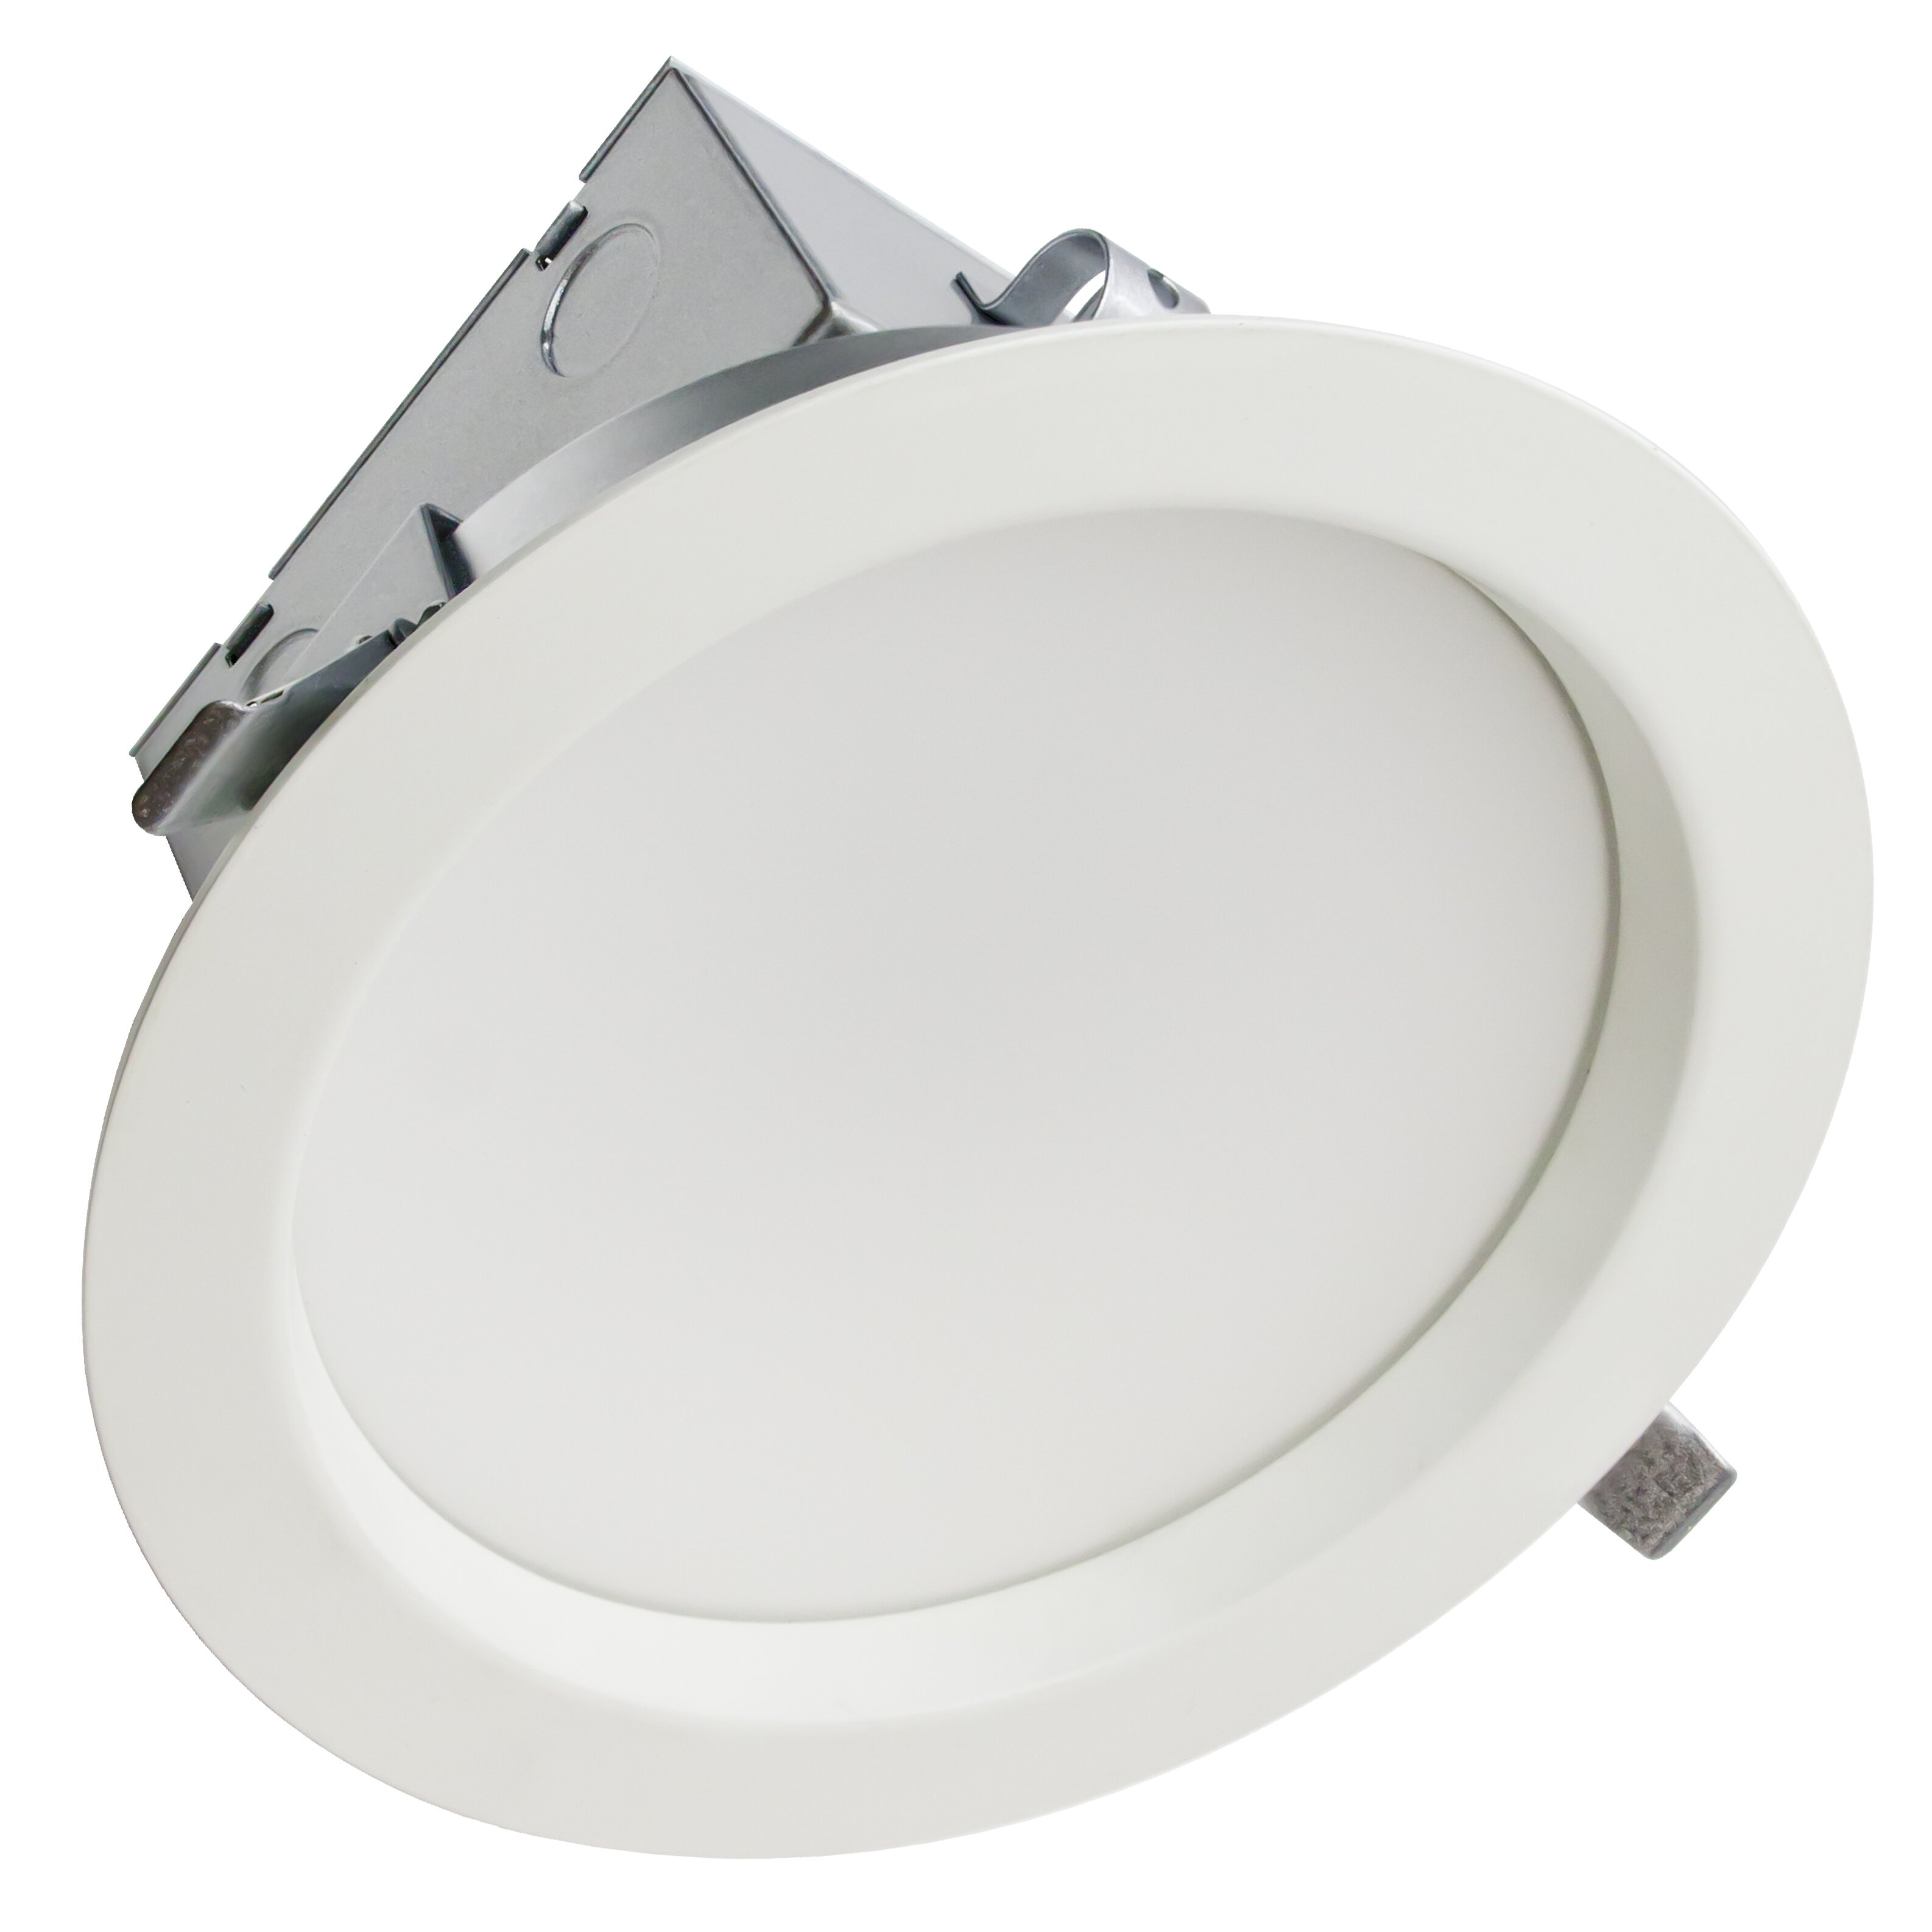 40W Magnum LED Downlight Wayfair Supply